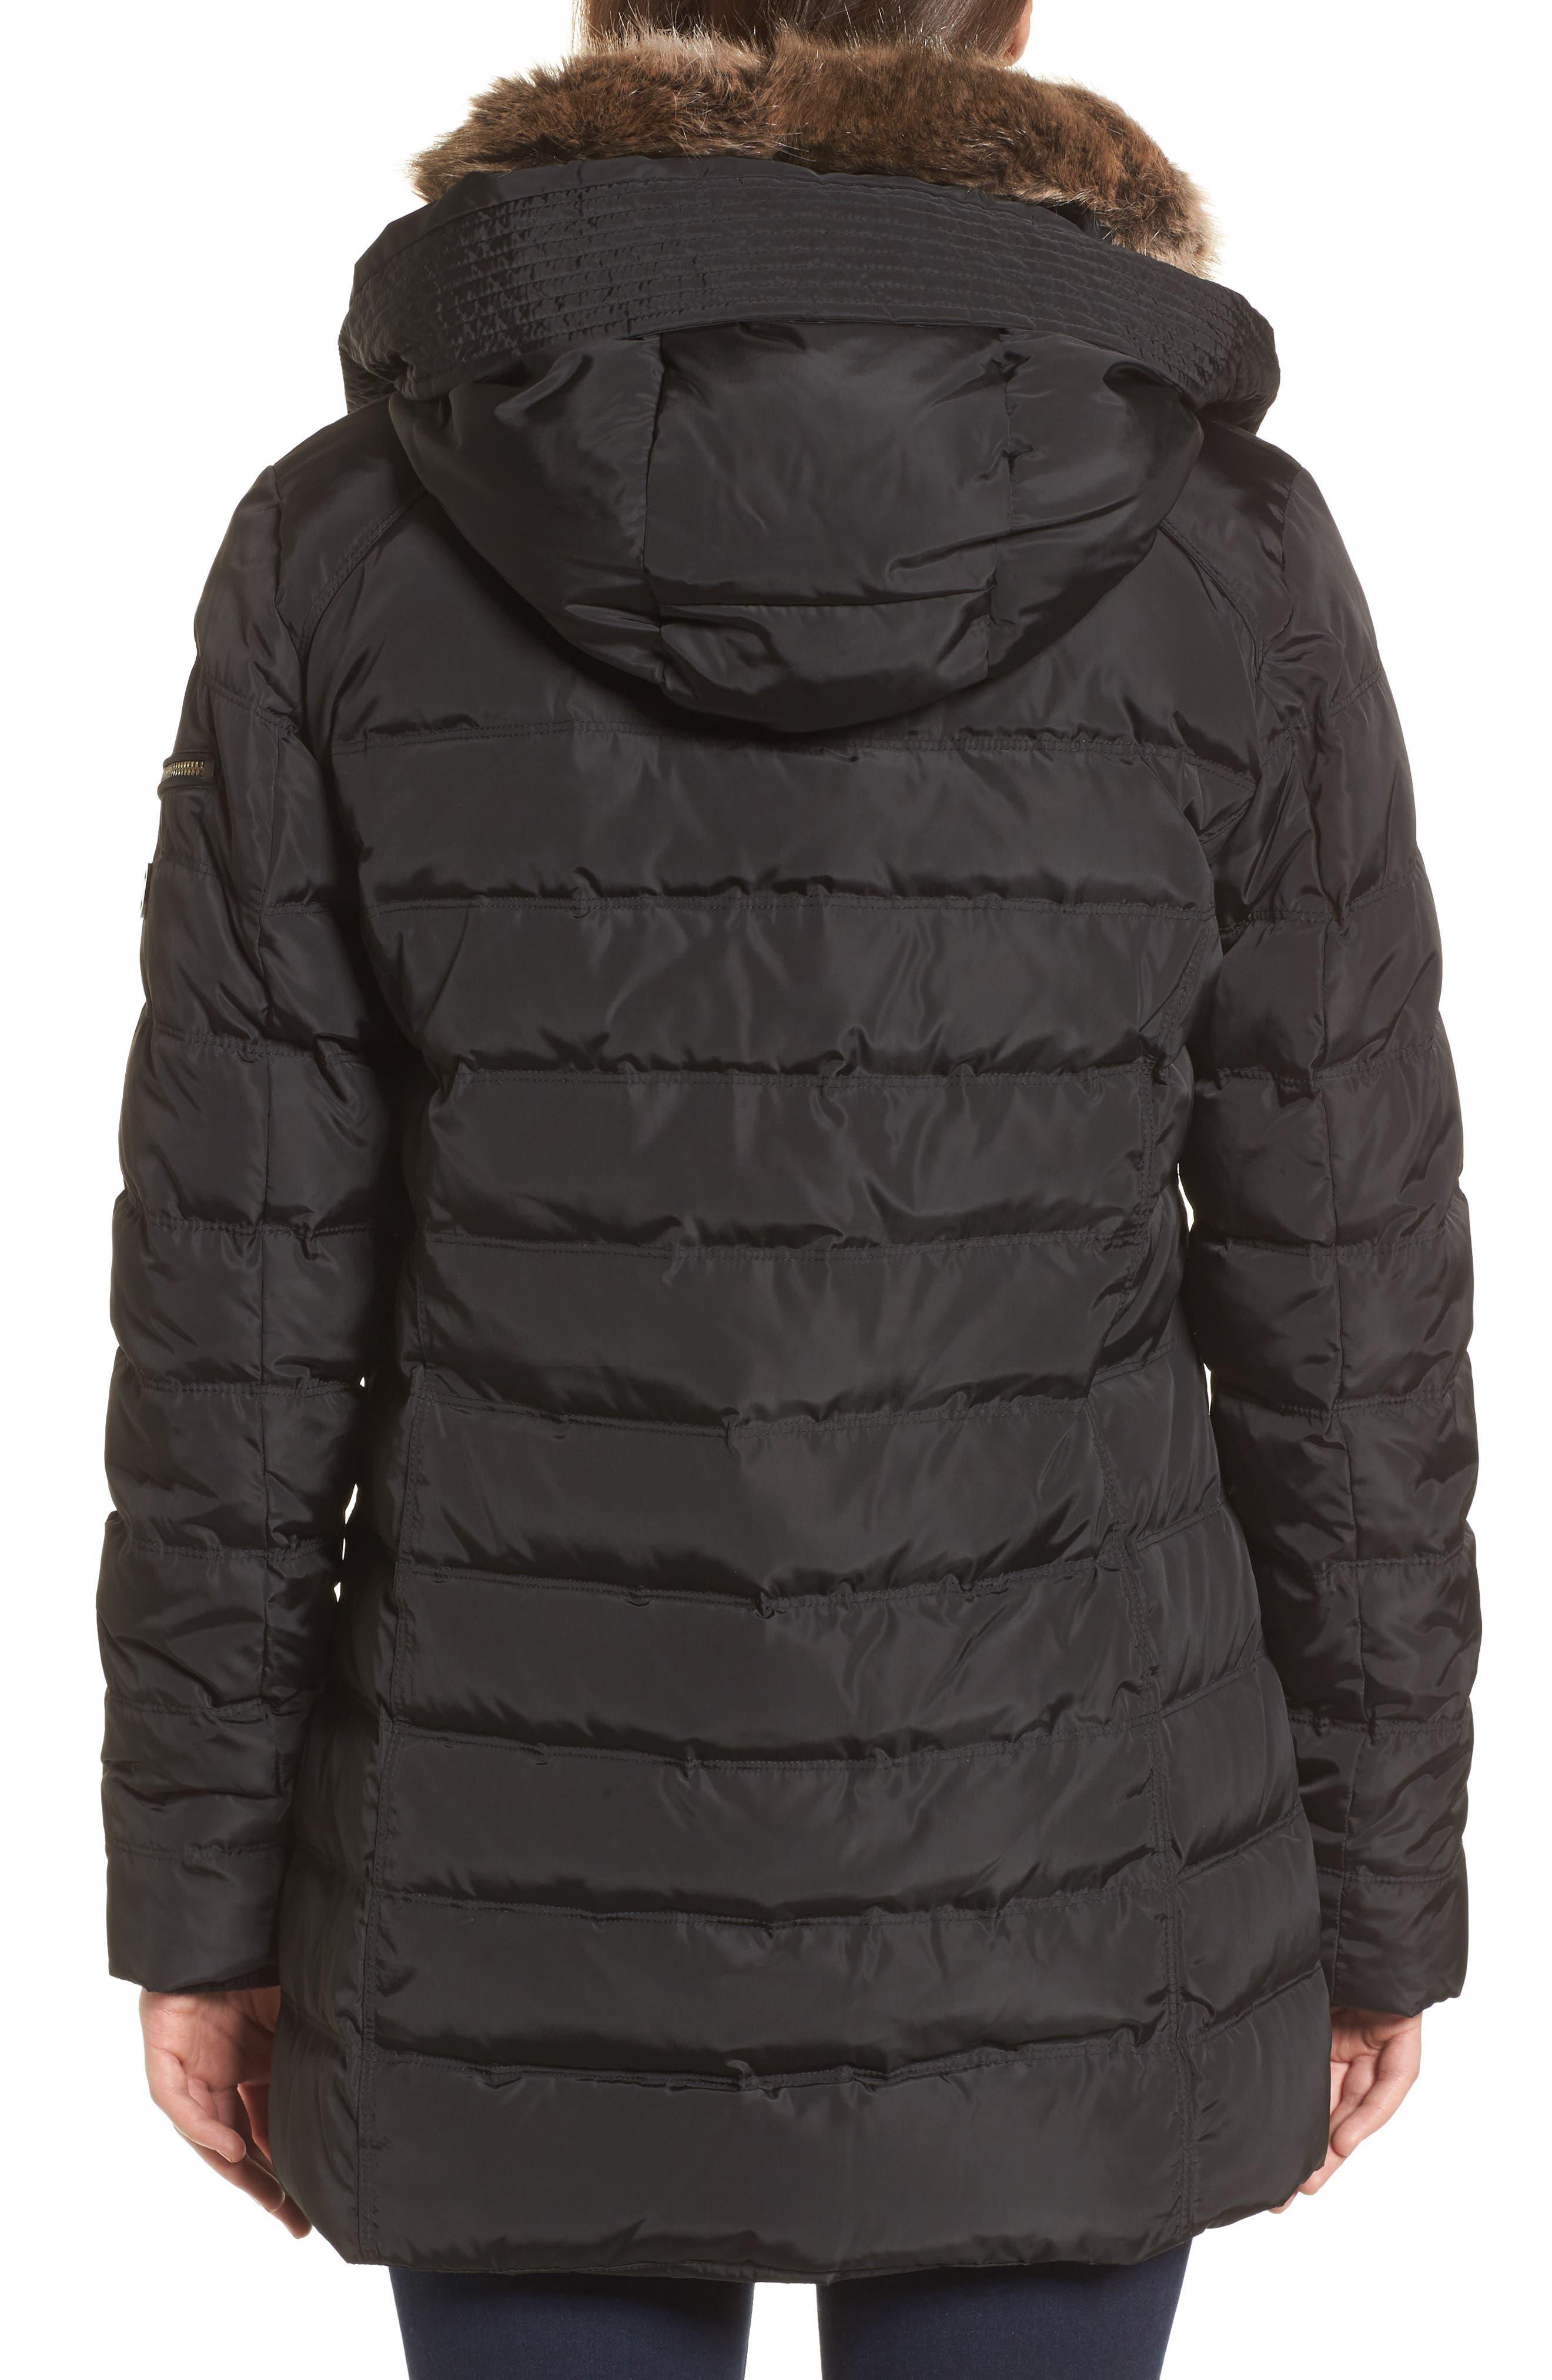 Hooded Coat with Faux Fur Trim,                             Alternate thumbnail 2, color,                             Black